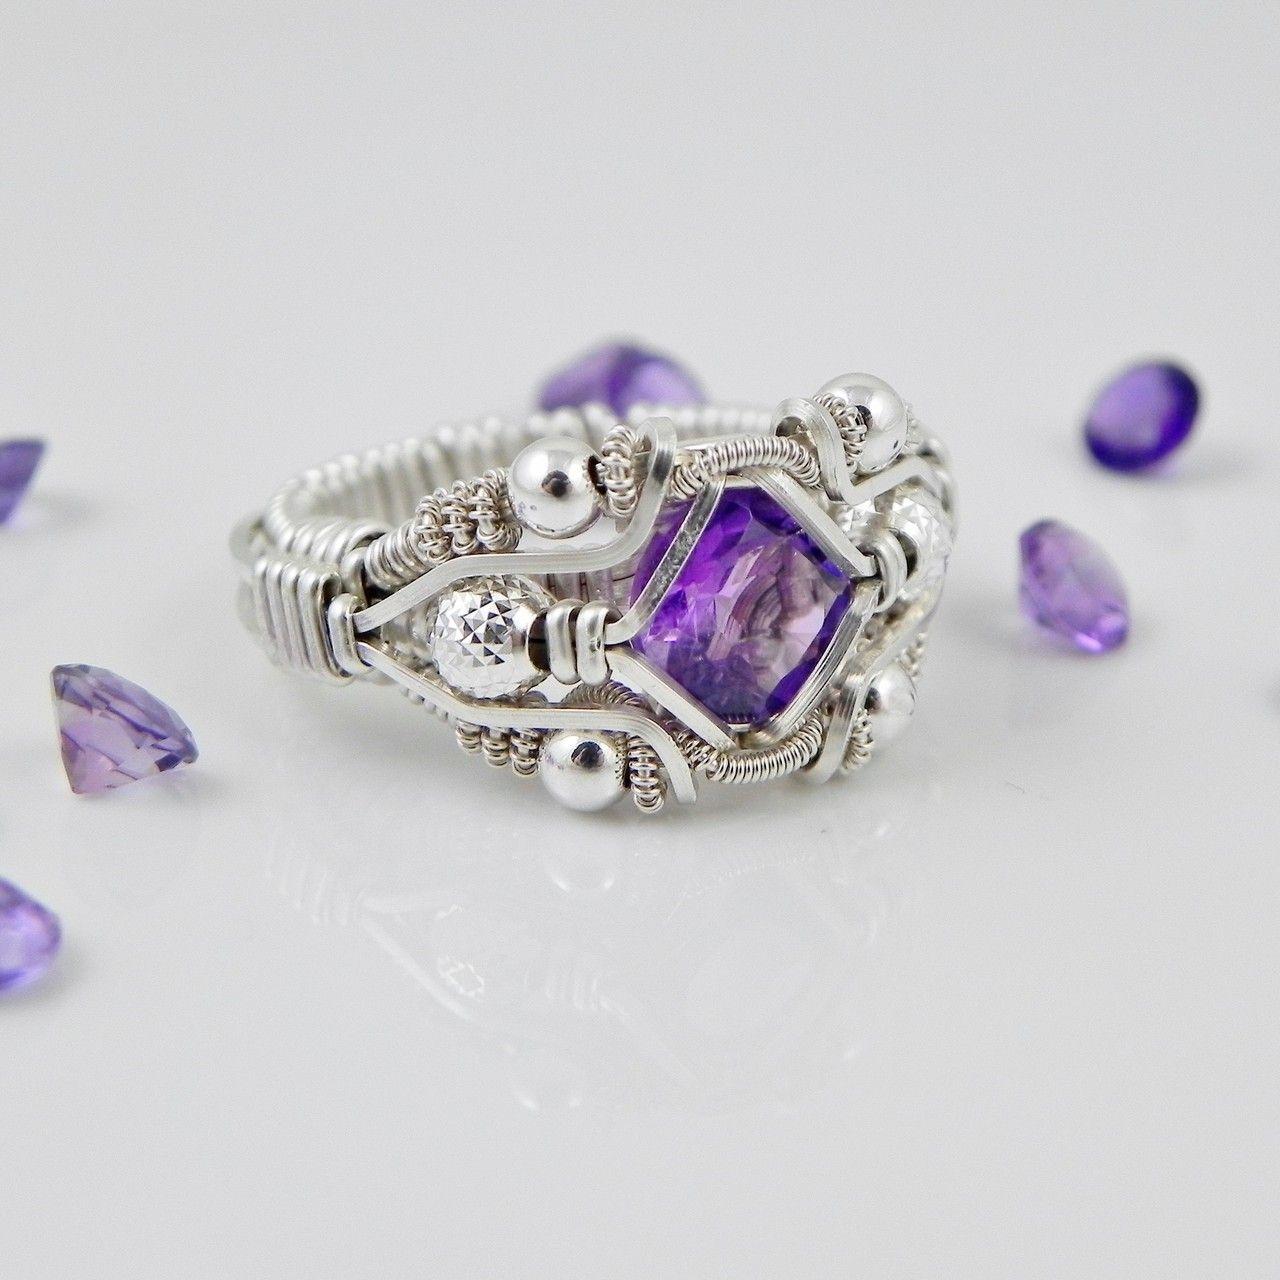 Gemstone Wire Wrapped Amethyst Ring Silver Handmade Fair Trade USA ...